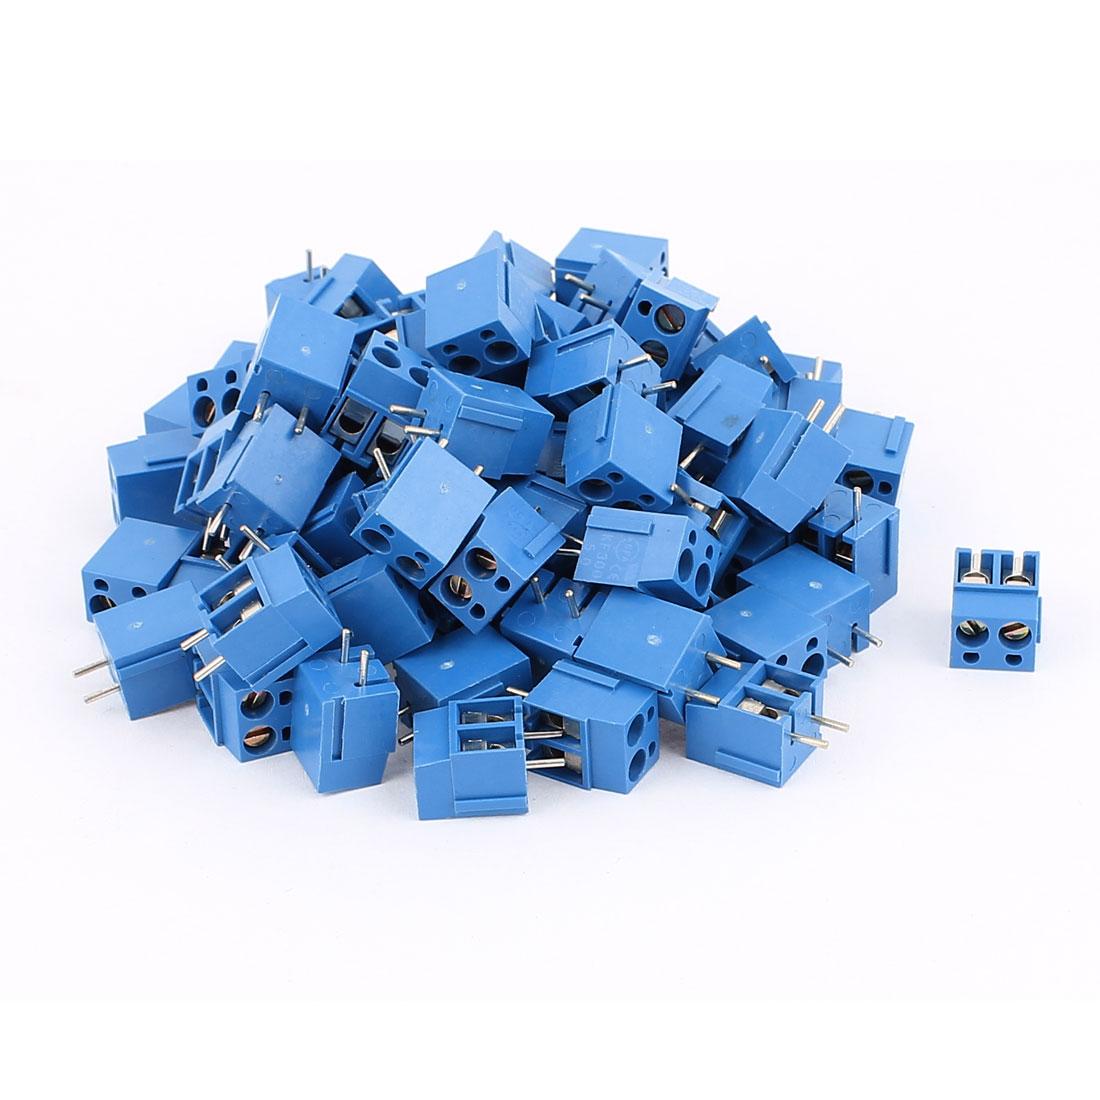 80 Pcs AC300V 16A 2 positions 1mm Pitch Pluggable Terminal Block Blue